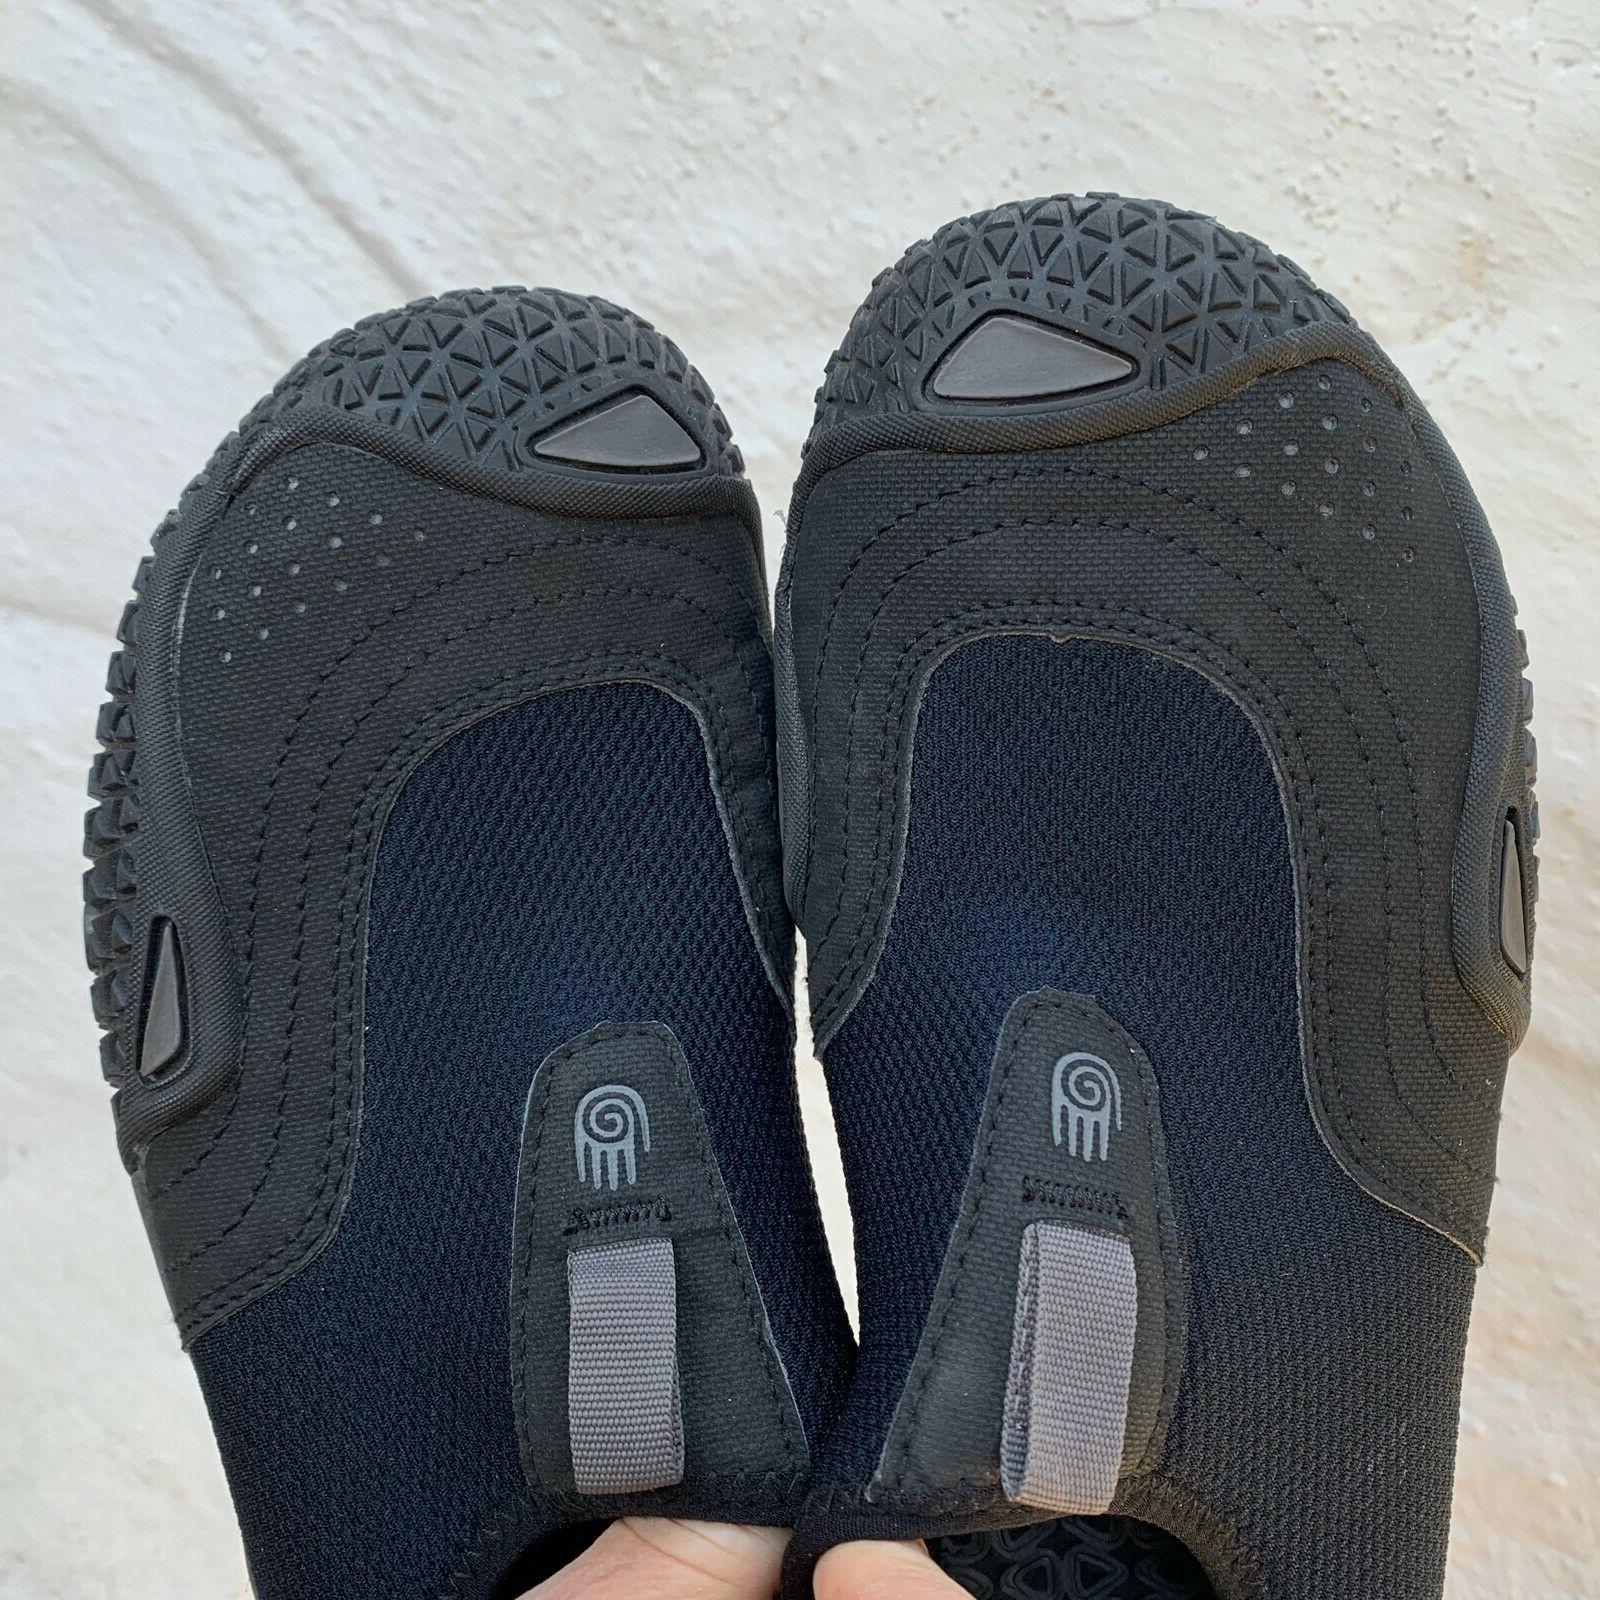 New Teva women's men's Eur 39 Water Shoes Black